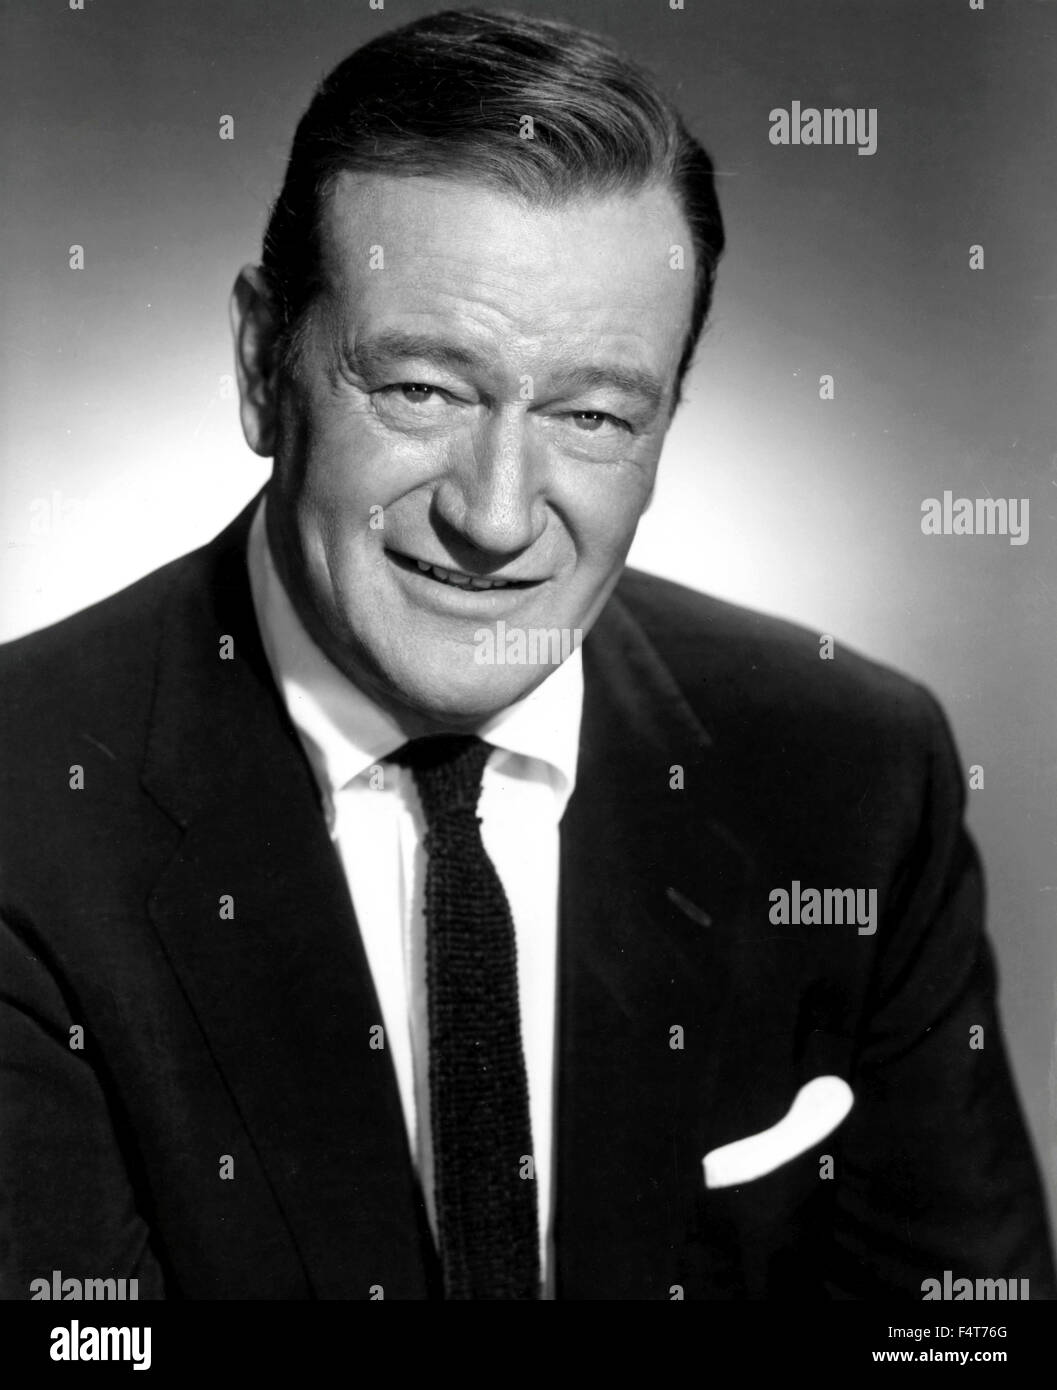 American actor John Wayne - Stock Image